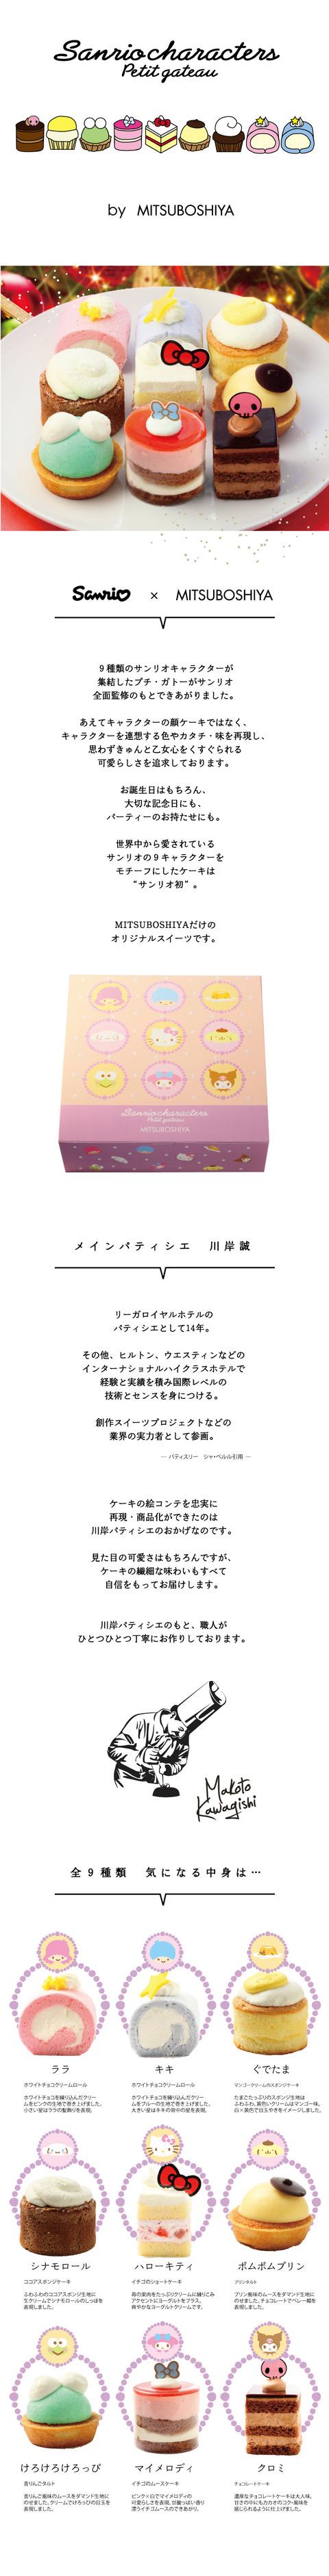 h-box02-xmas-smp1